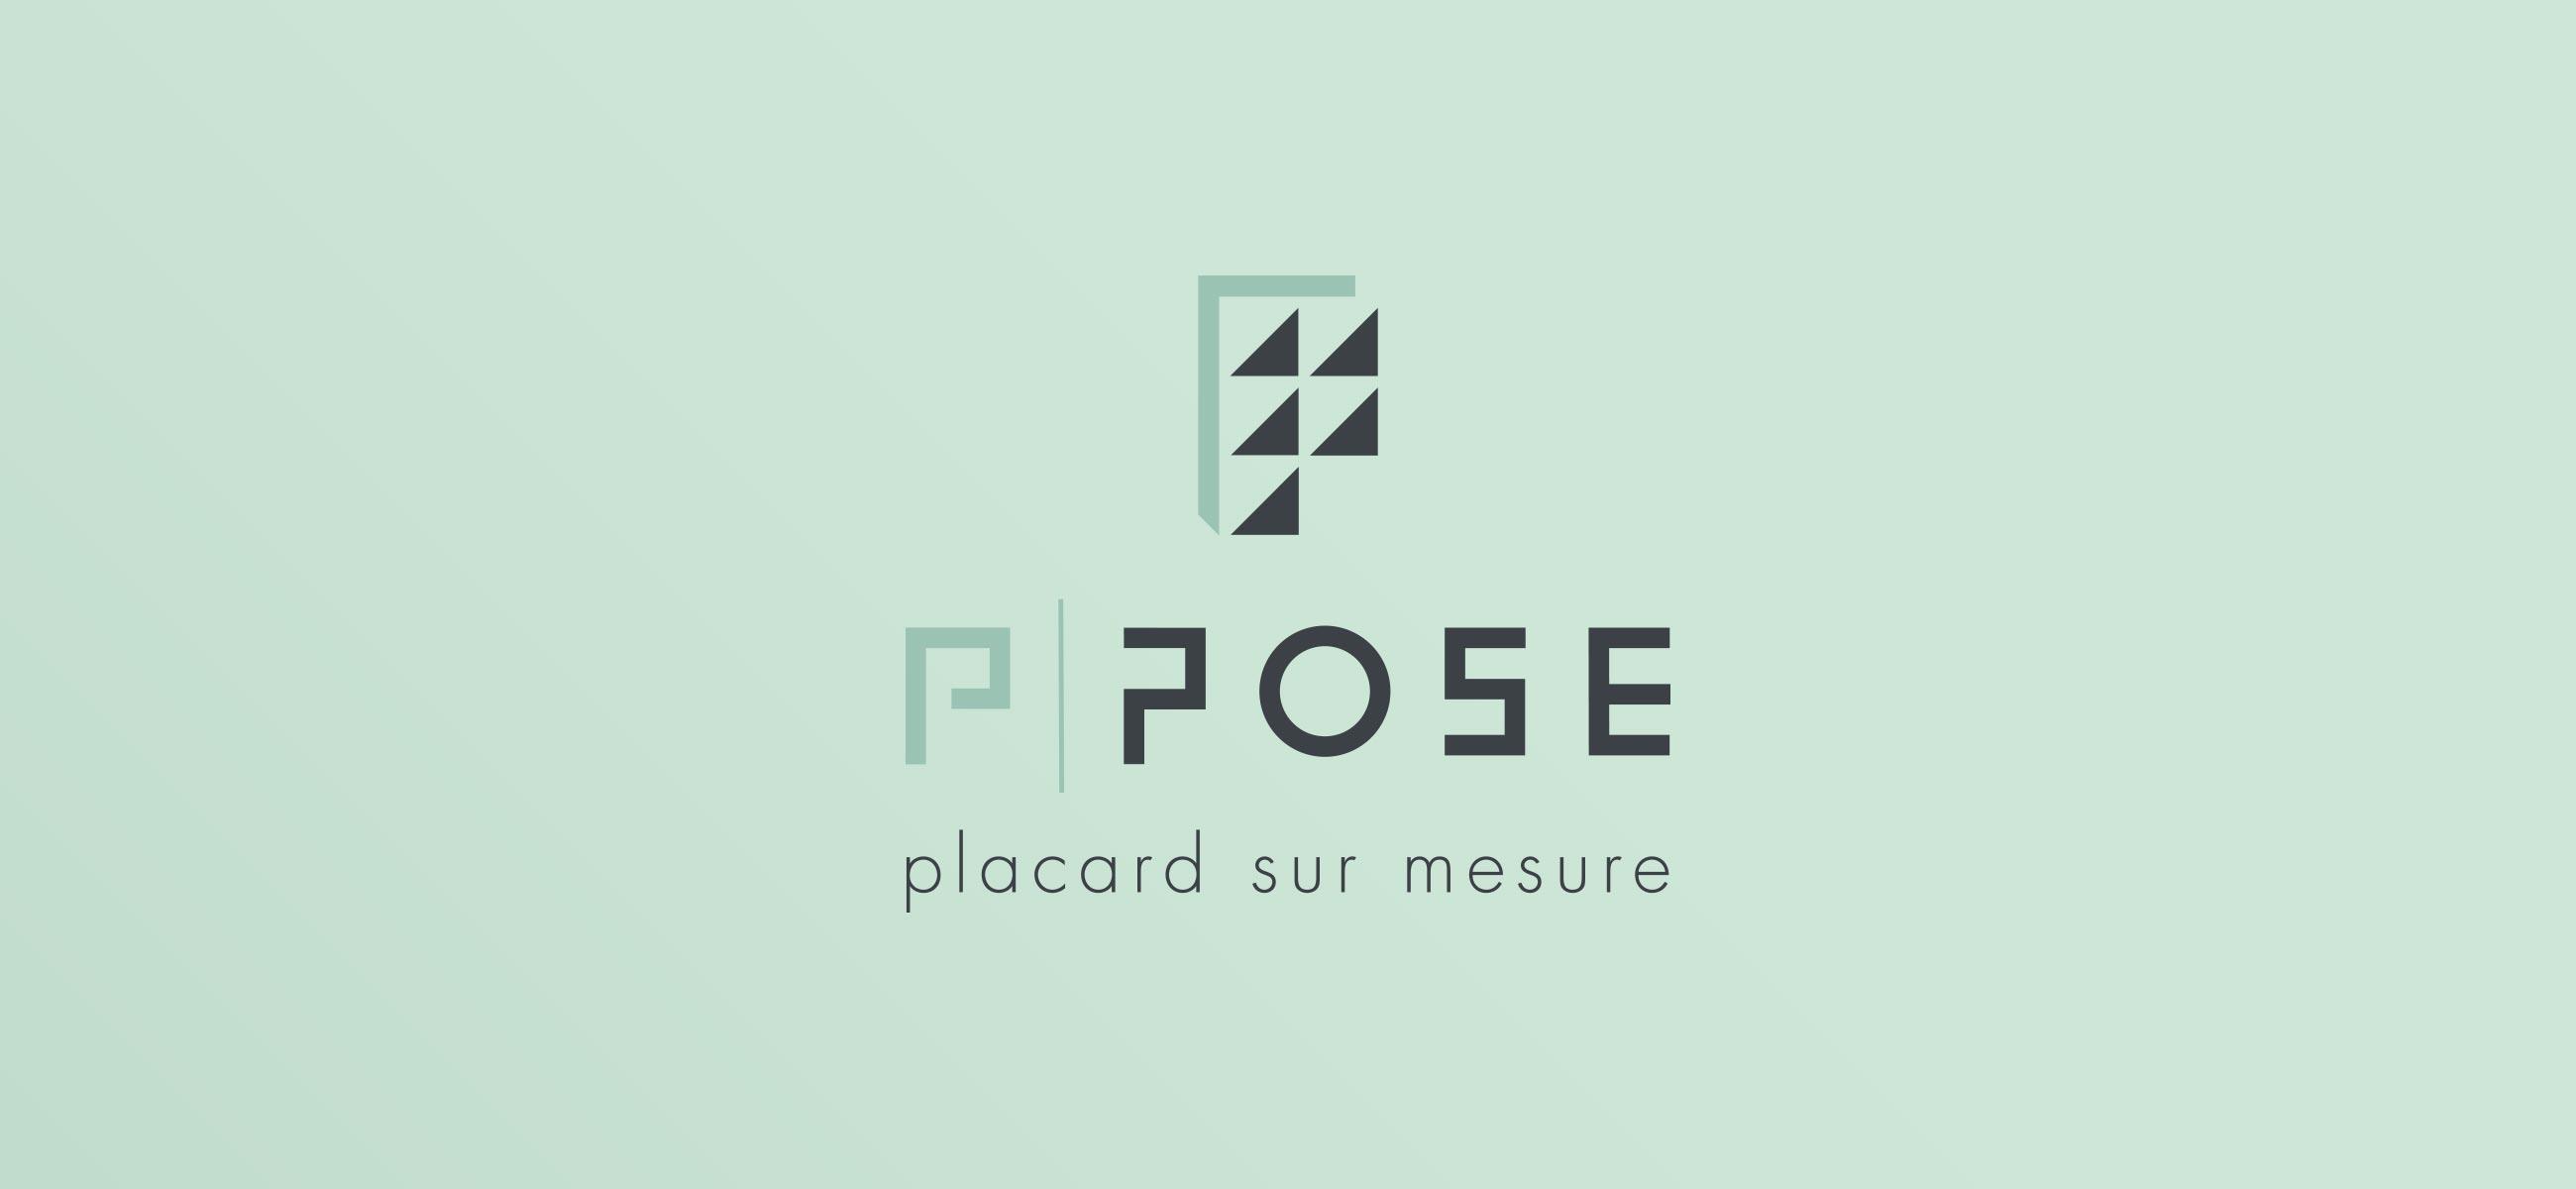 p_pose_01_parallele_graphique